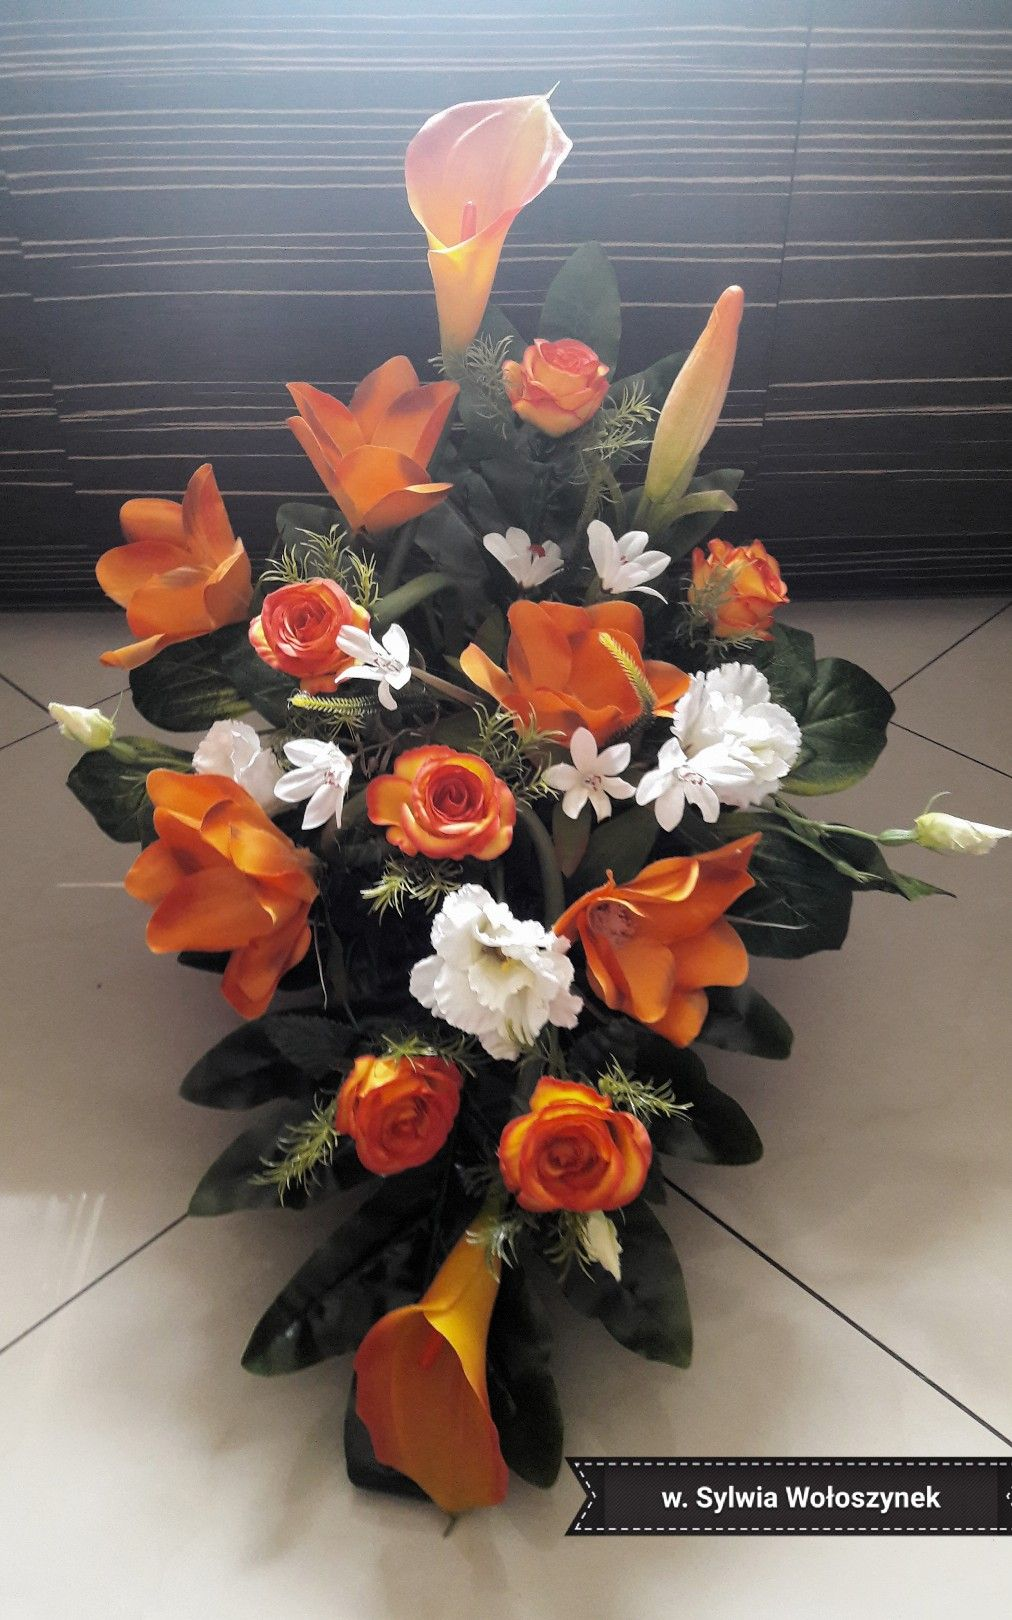 Kompozycja Nagrobna Wiosna 2018 Wyk Sylwia Woloszynek Funeral Flower Arrangements Flower Arrangements Funeral Flowers